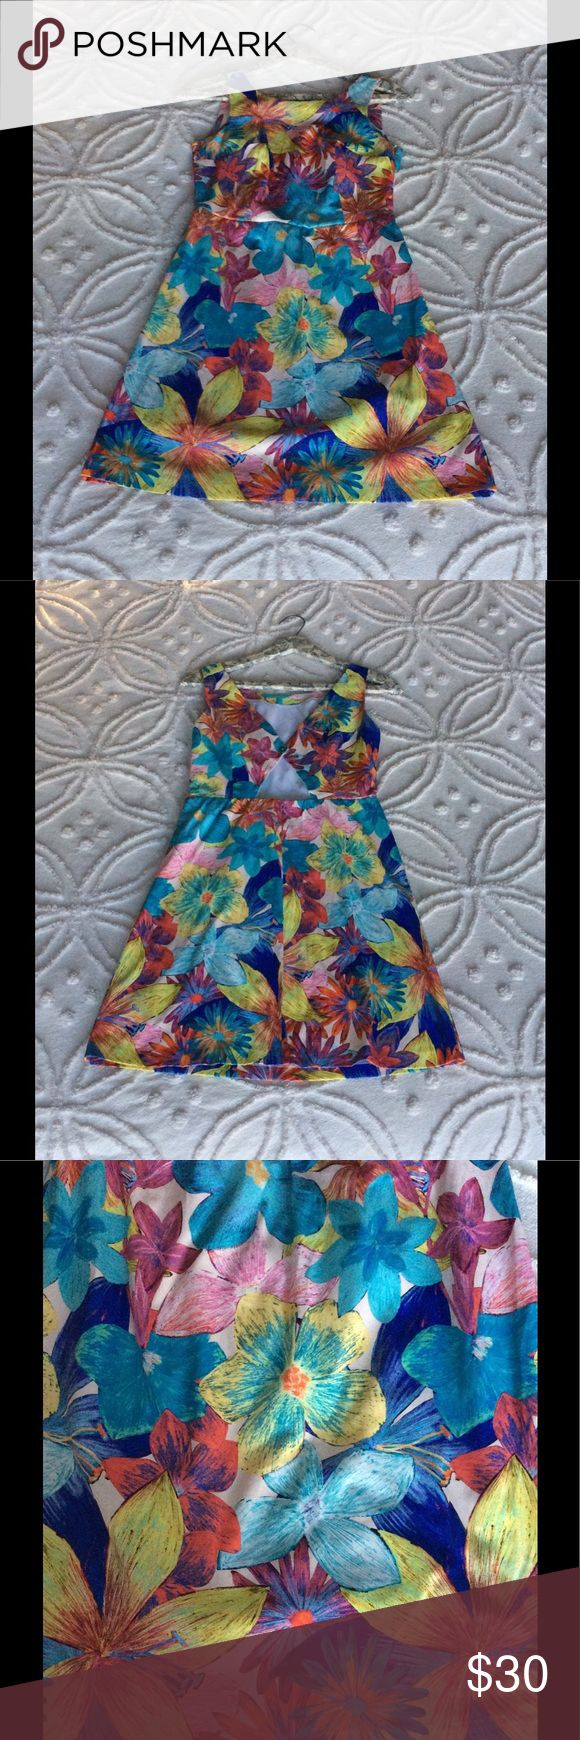 Zara flower dress (size M) Beautiful Zara dress, open in the back, made in Brazil. Soft flower pattern fabric. Size medium. Zara Dresses Mini